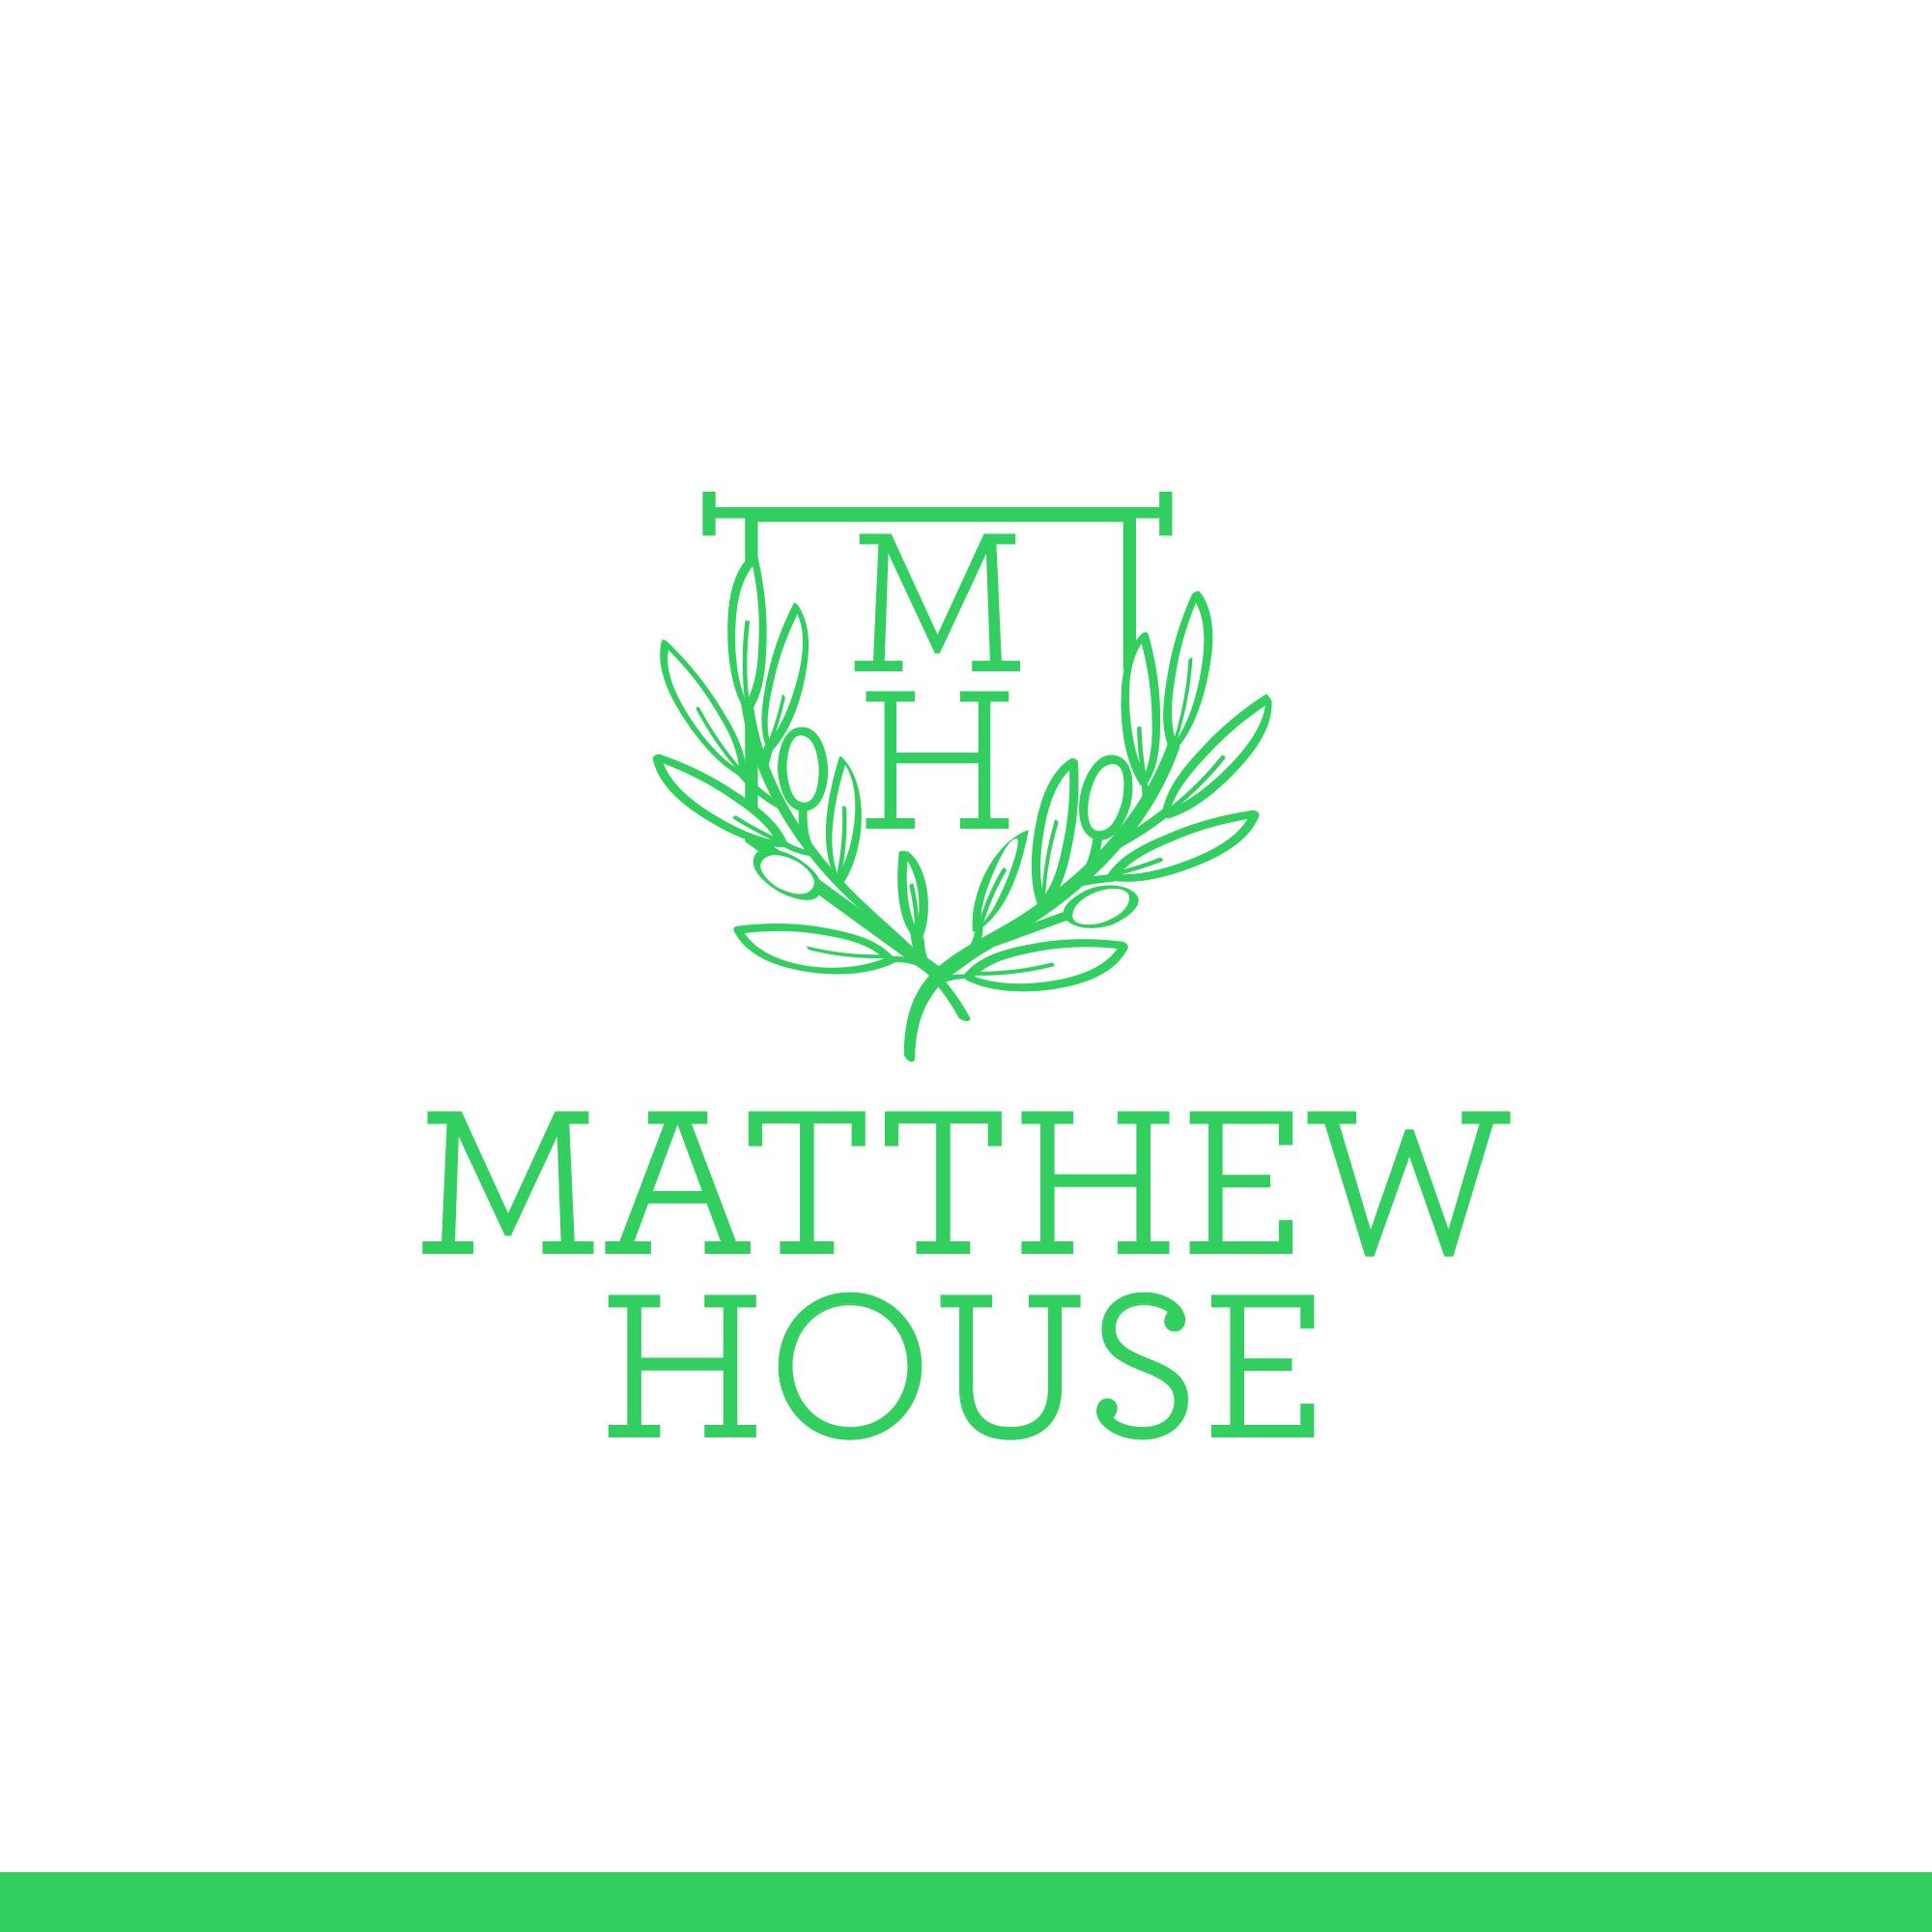 030 Matthew House-Green.jpg